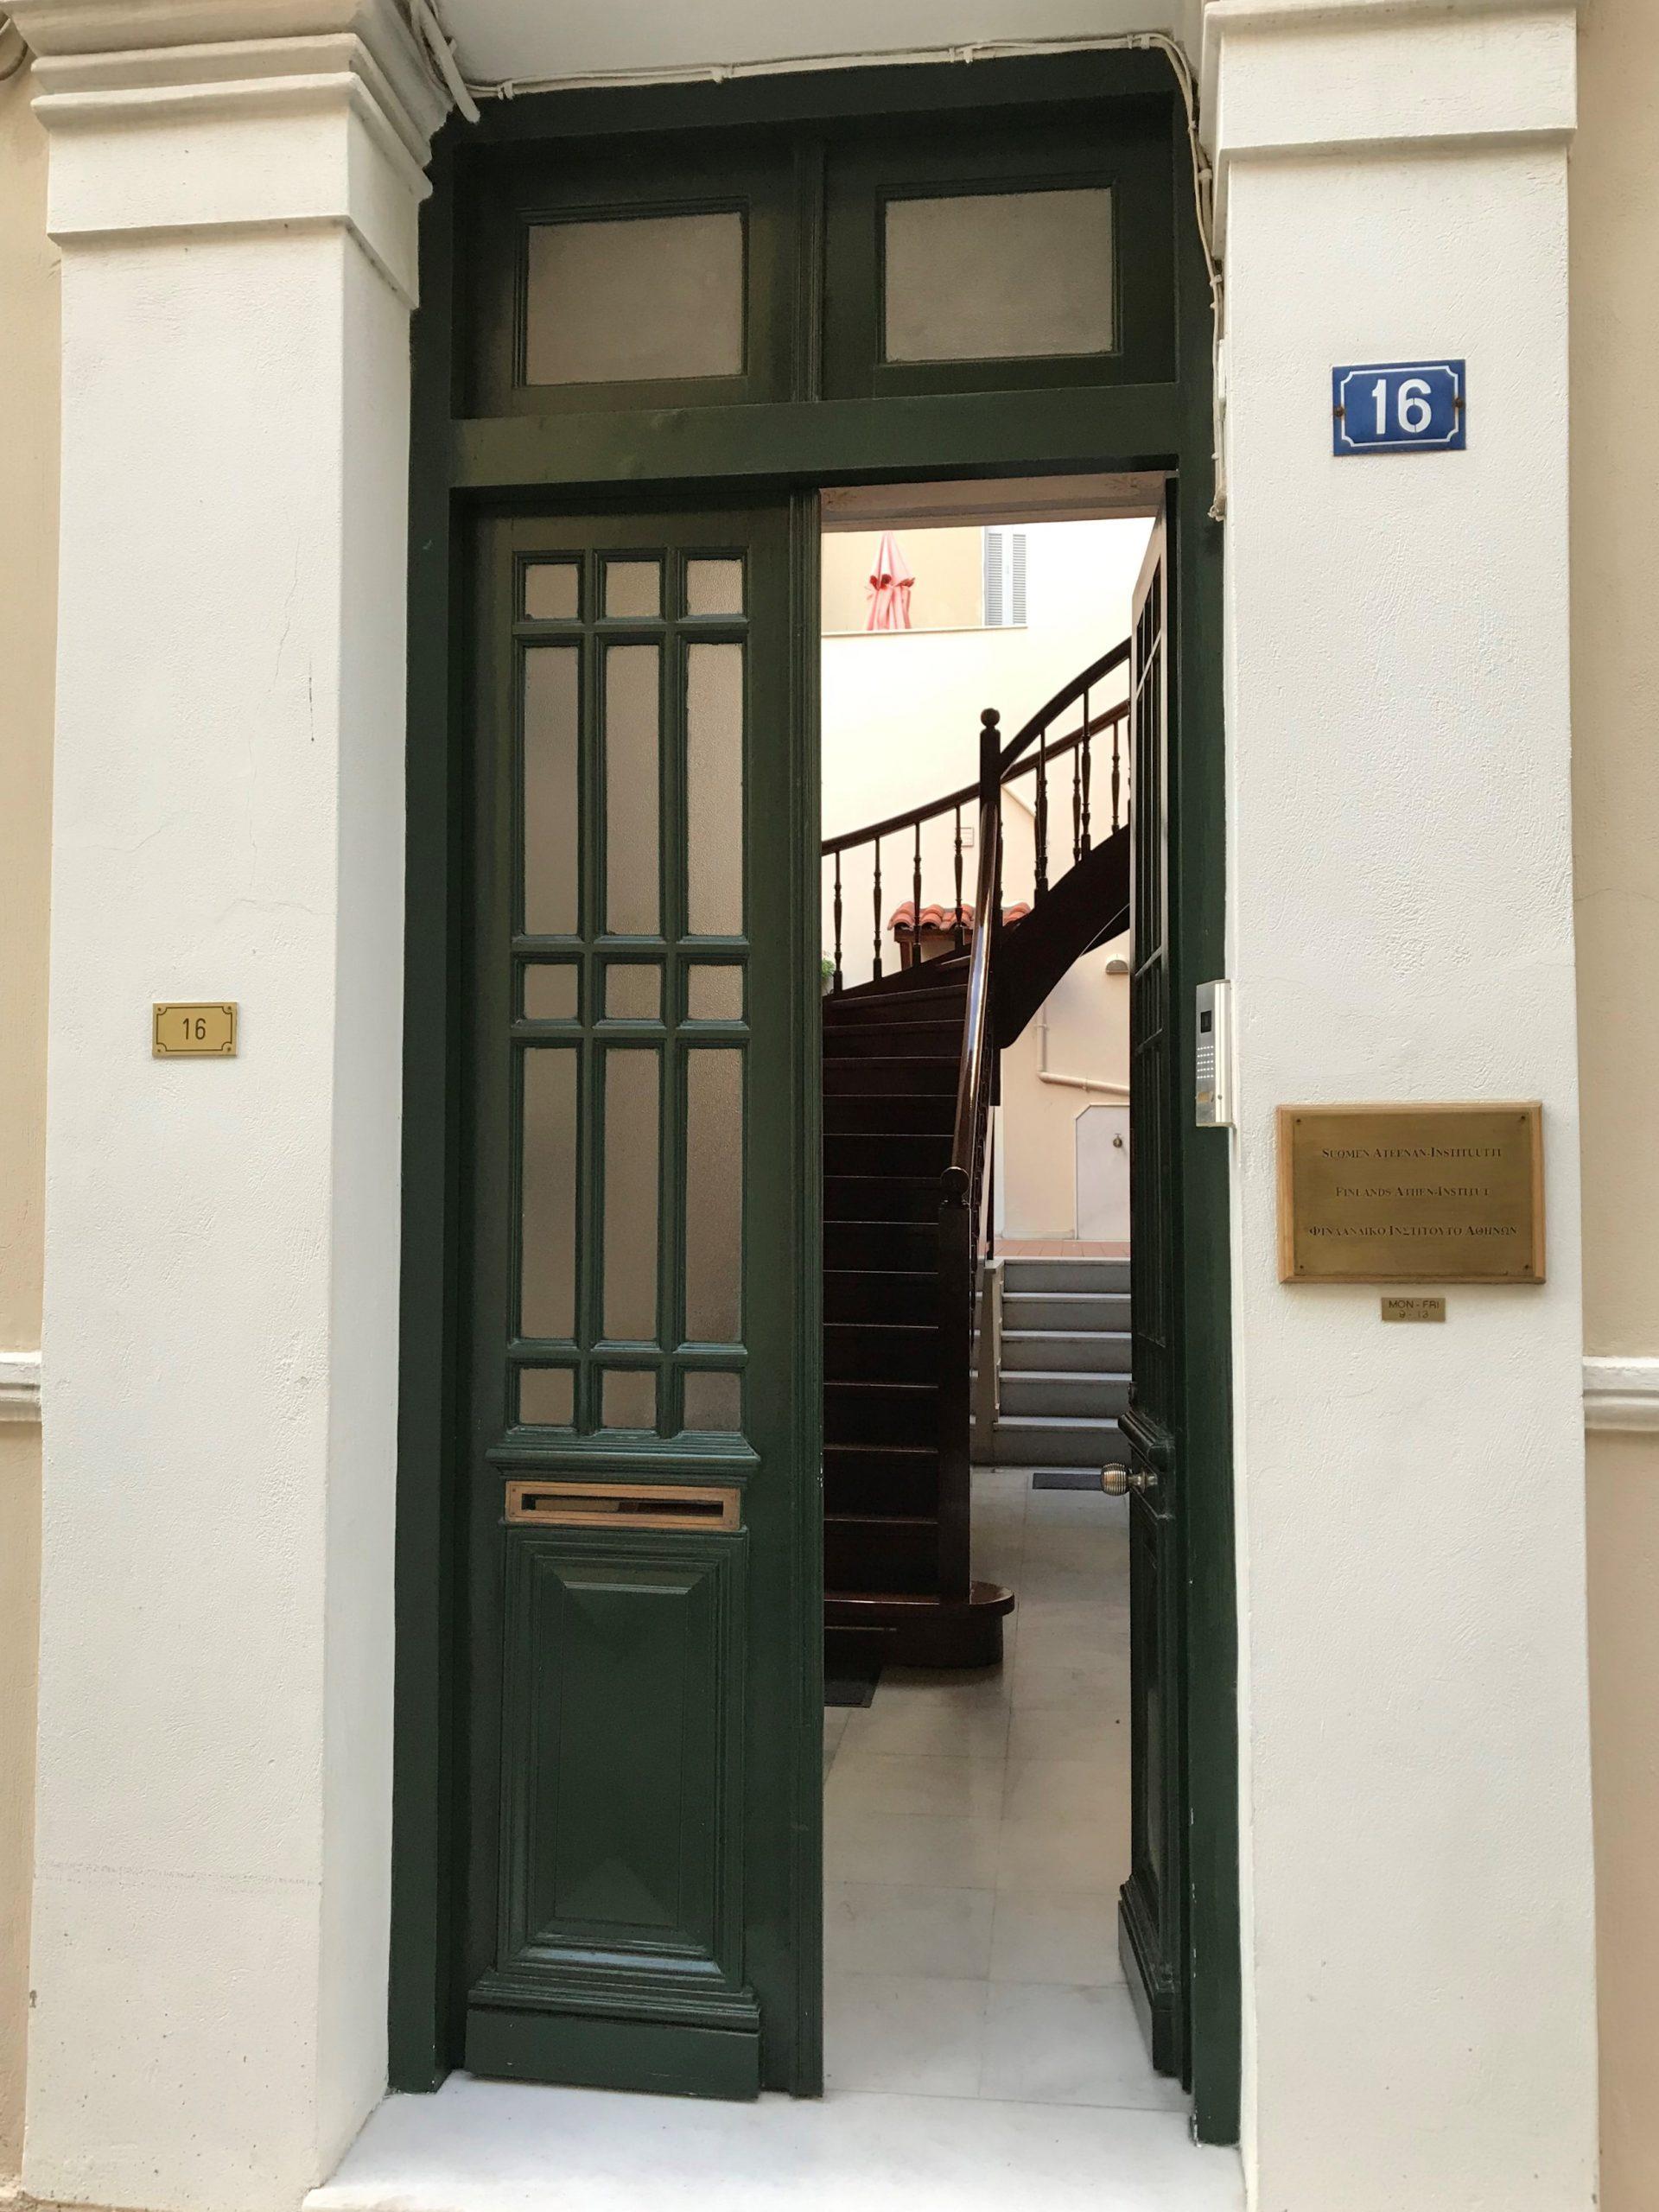 Suomen Ateenan-instituutti